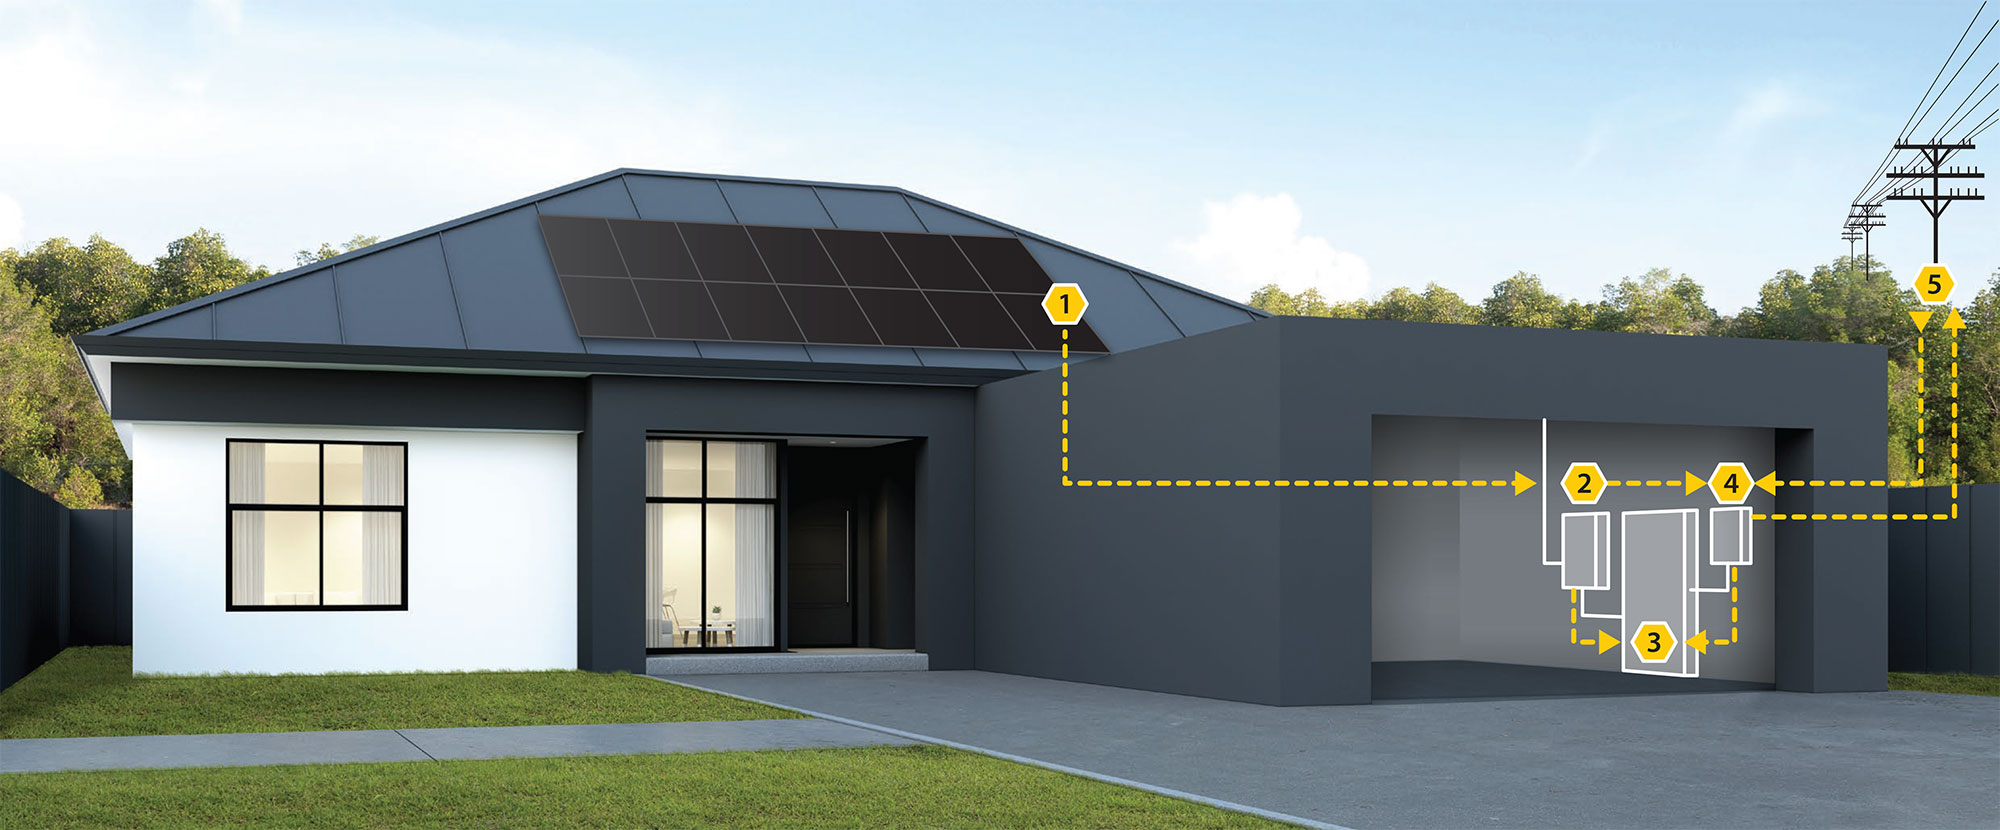 The solar process